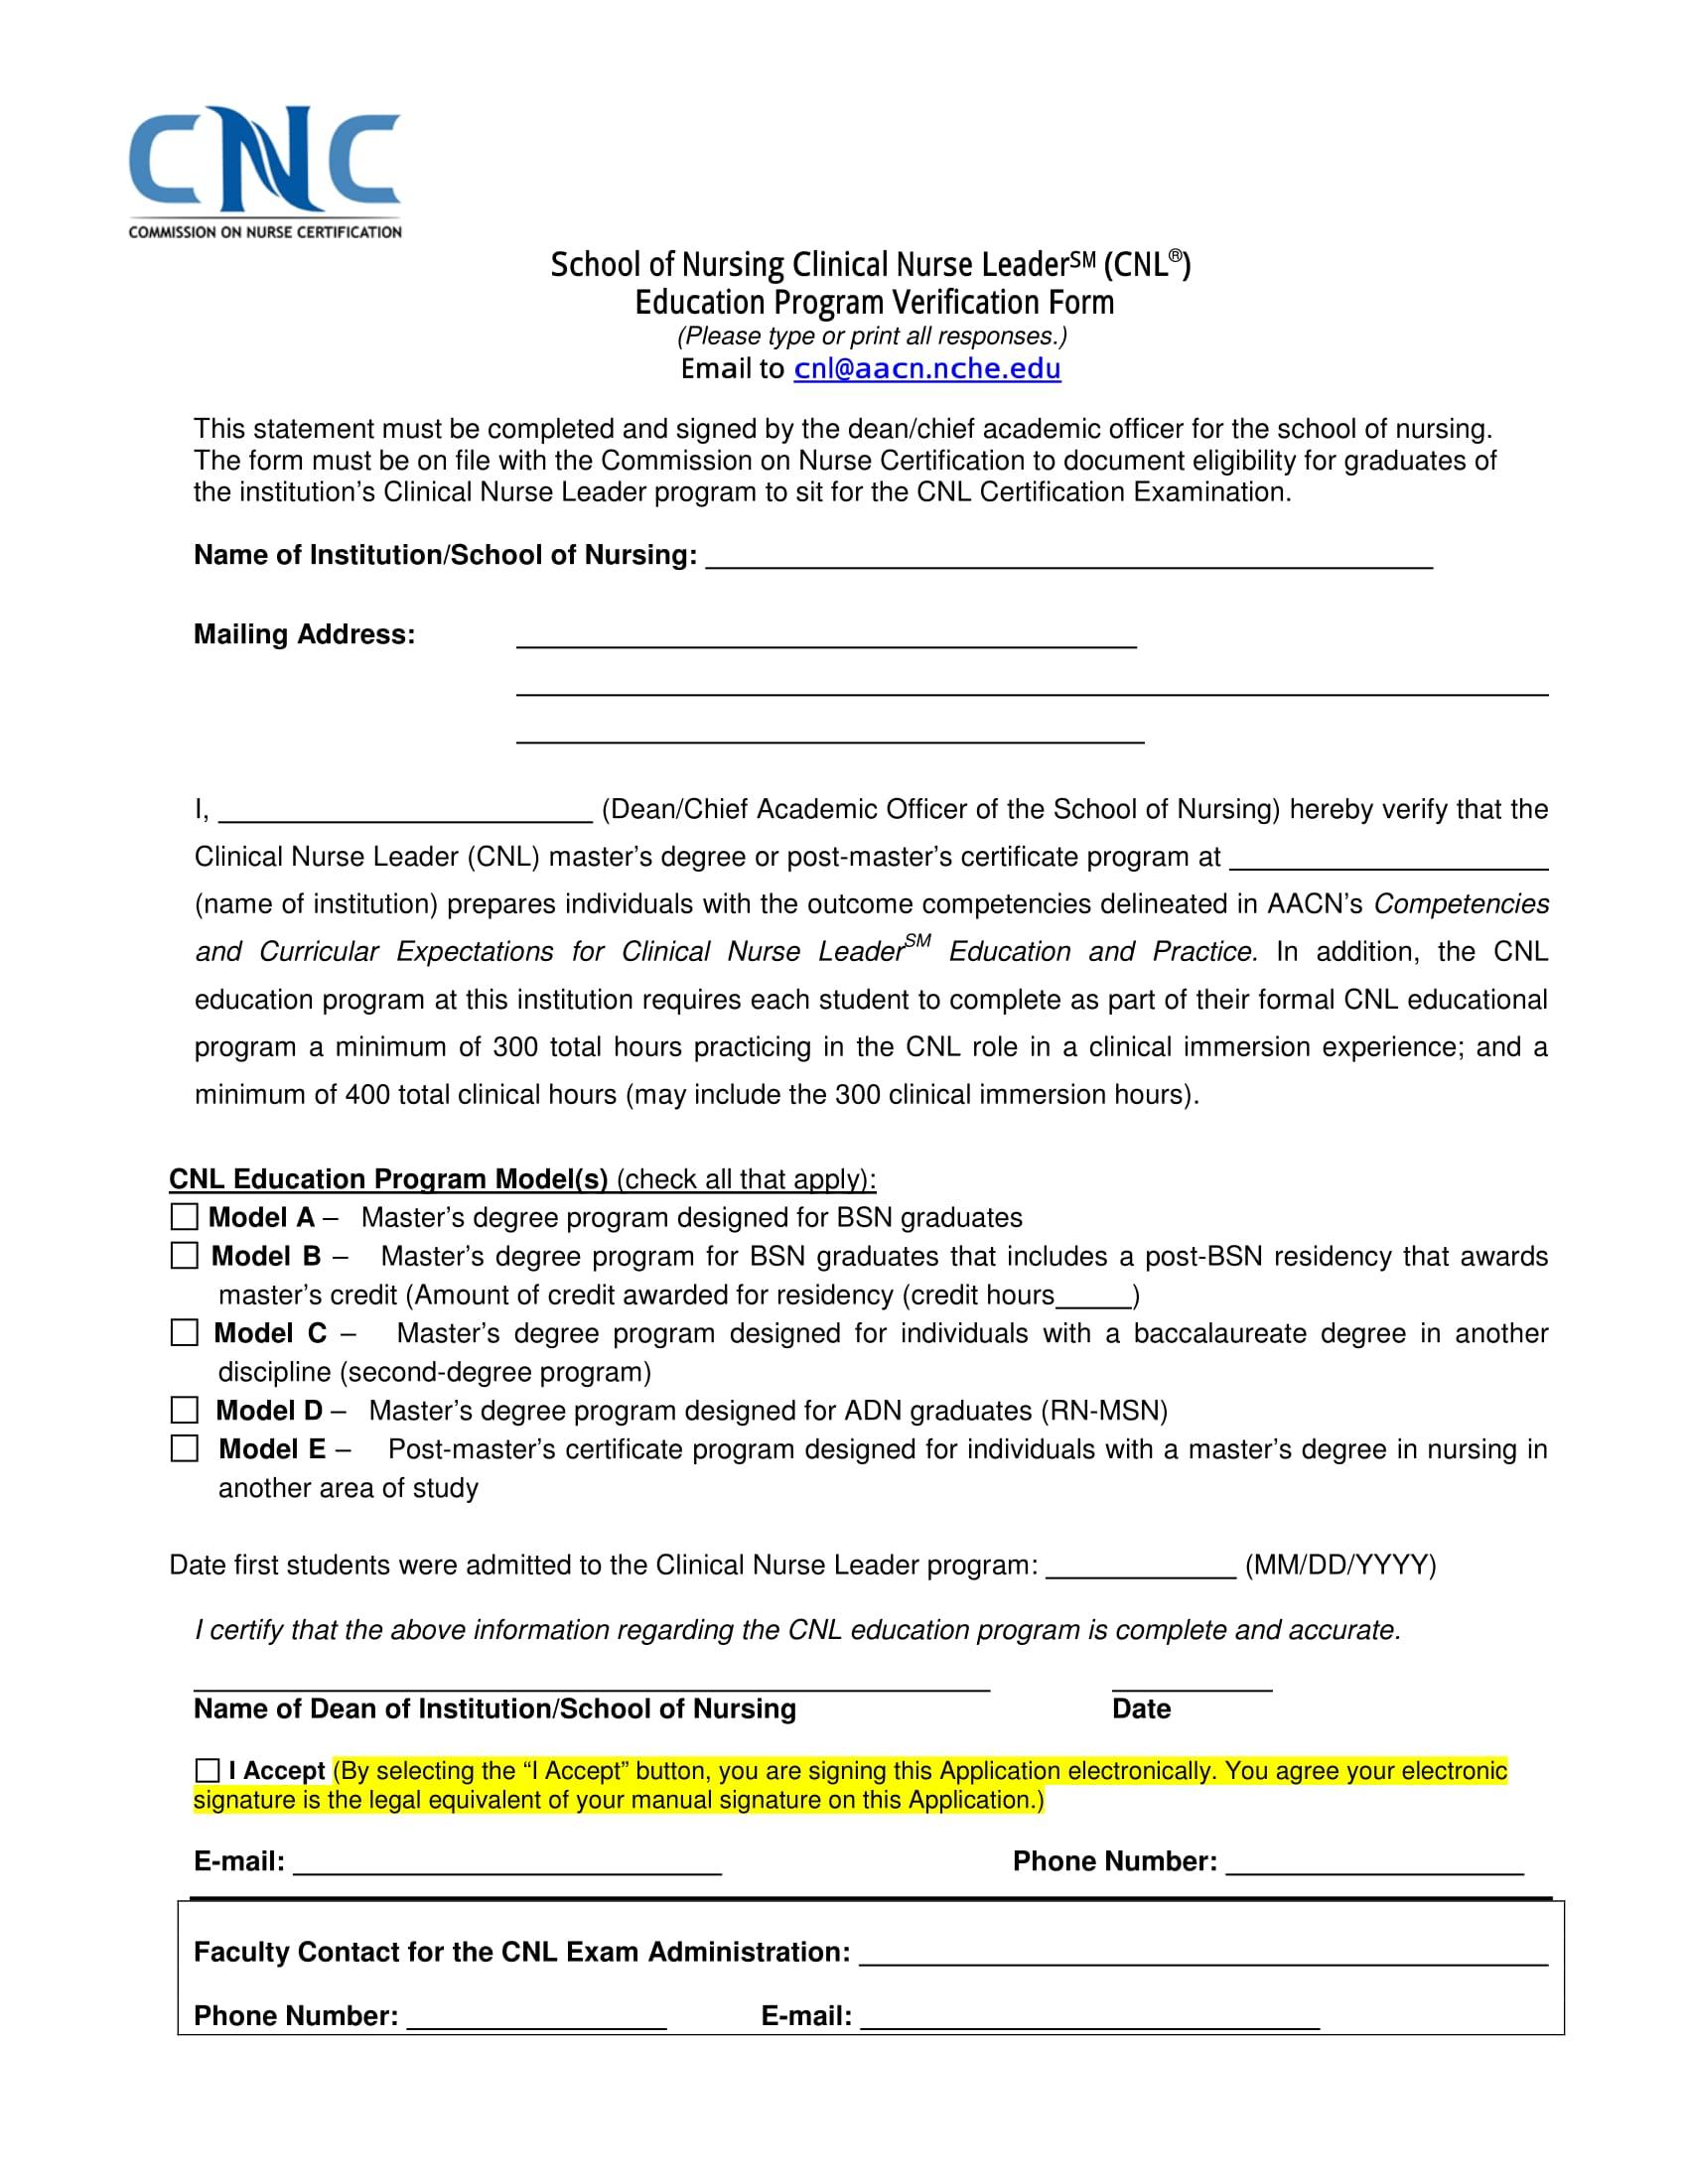 education program verification form 1